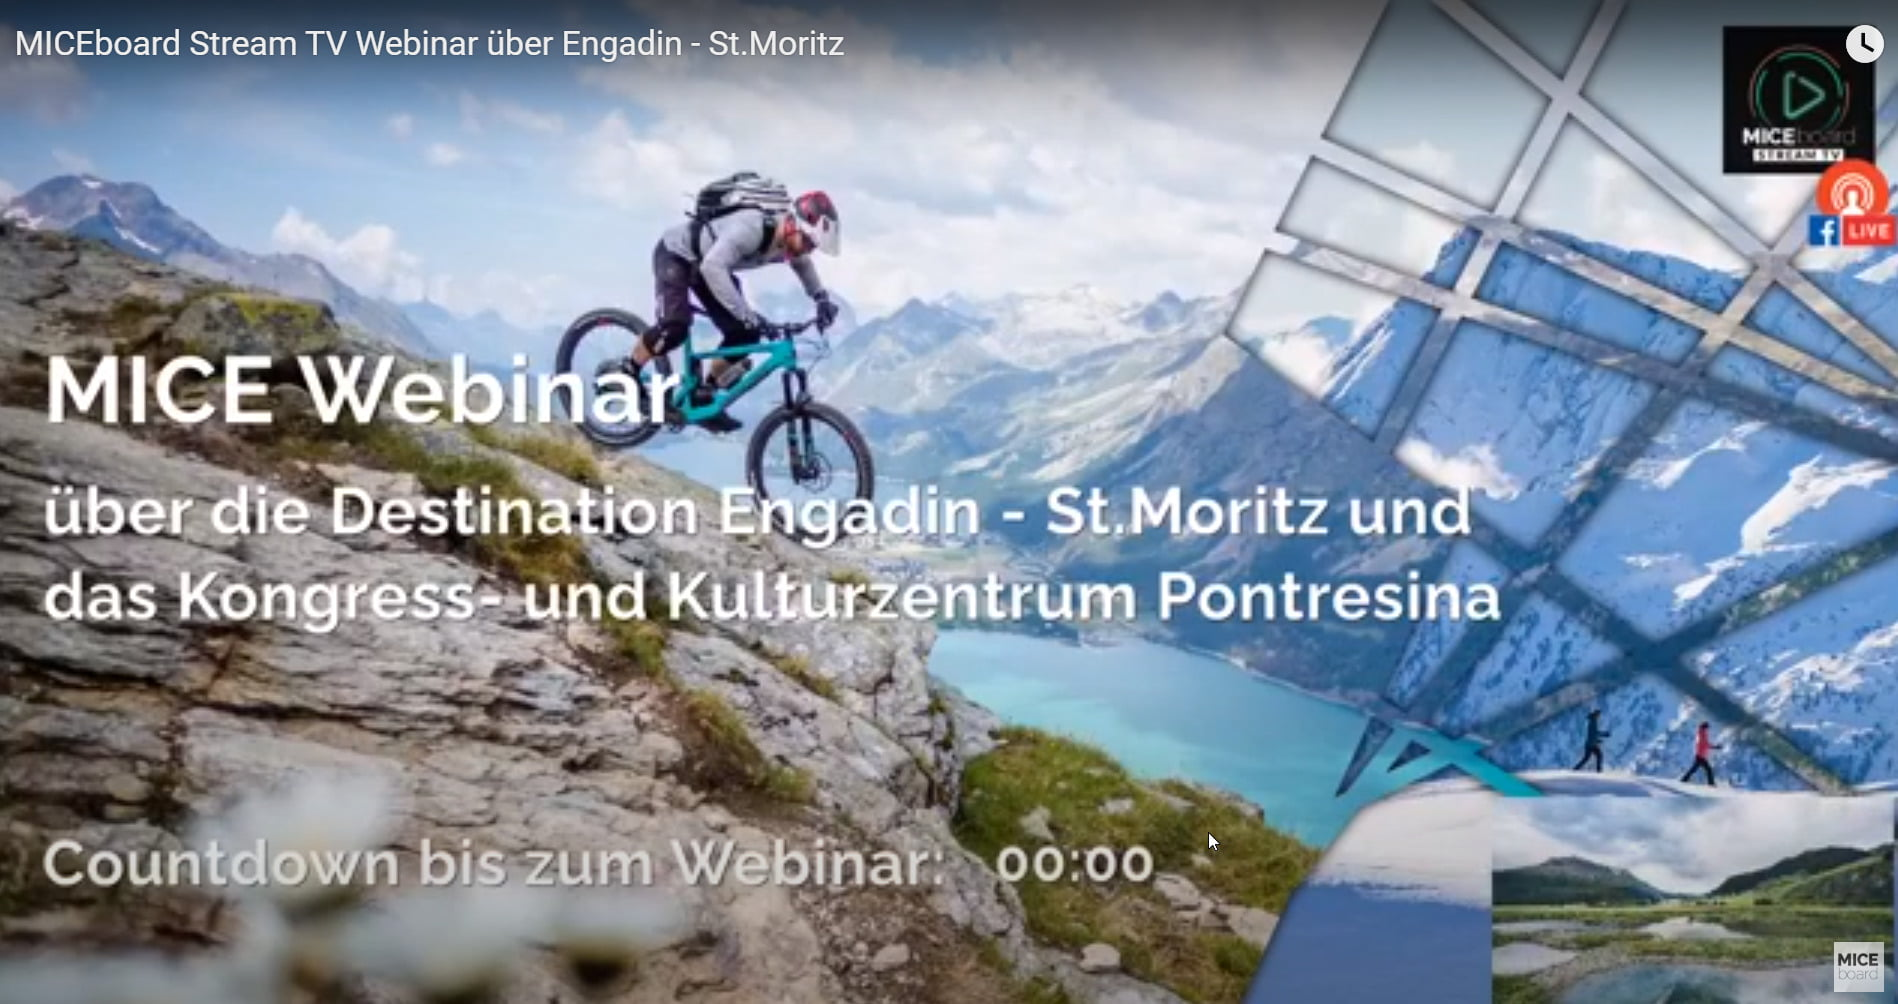 Webinar Engadin St. Moritz